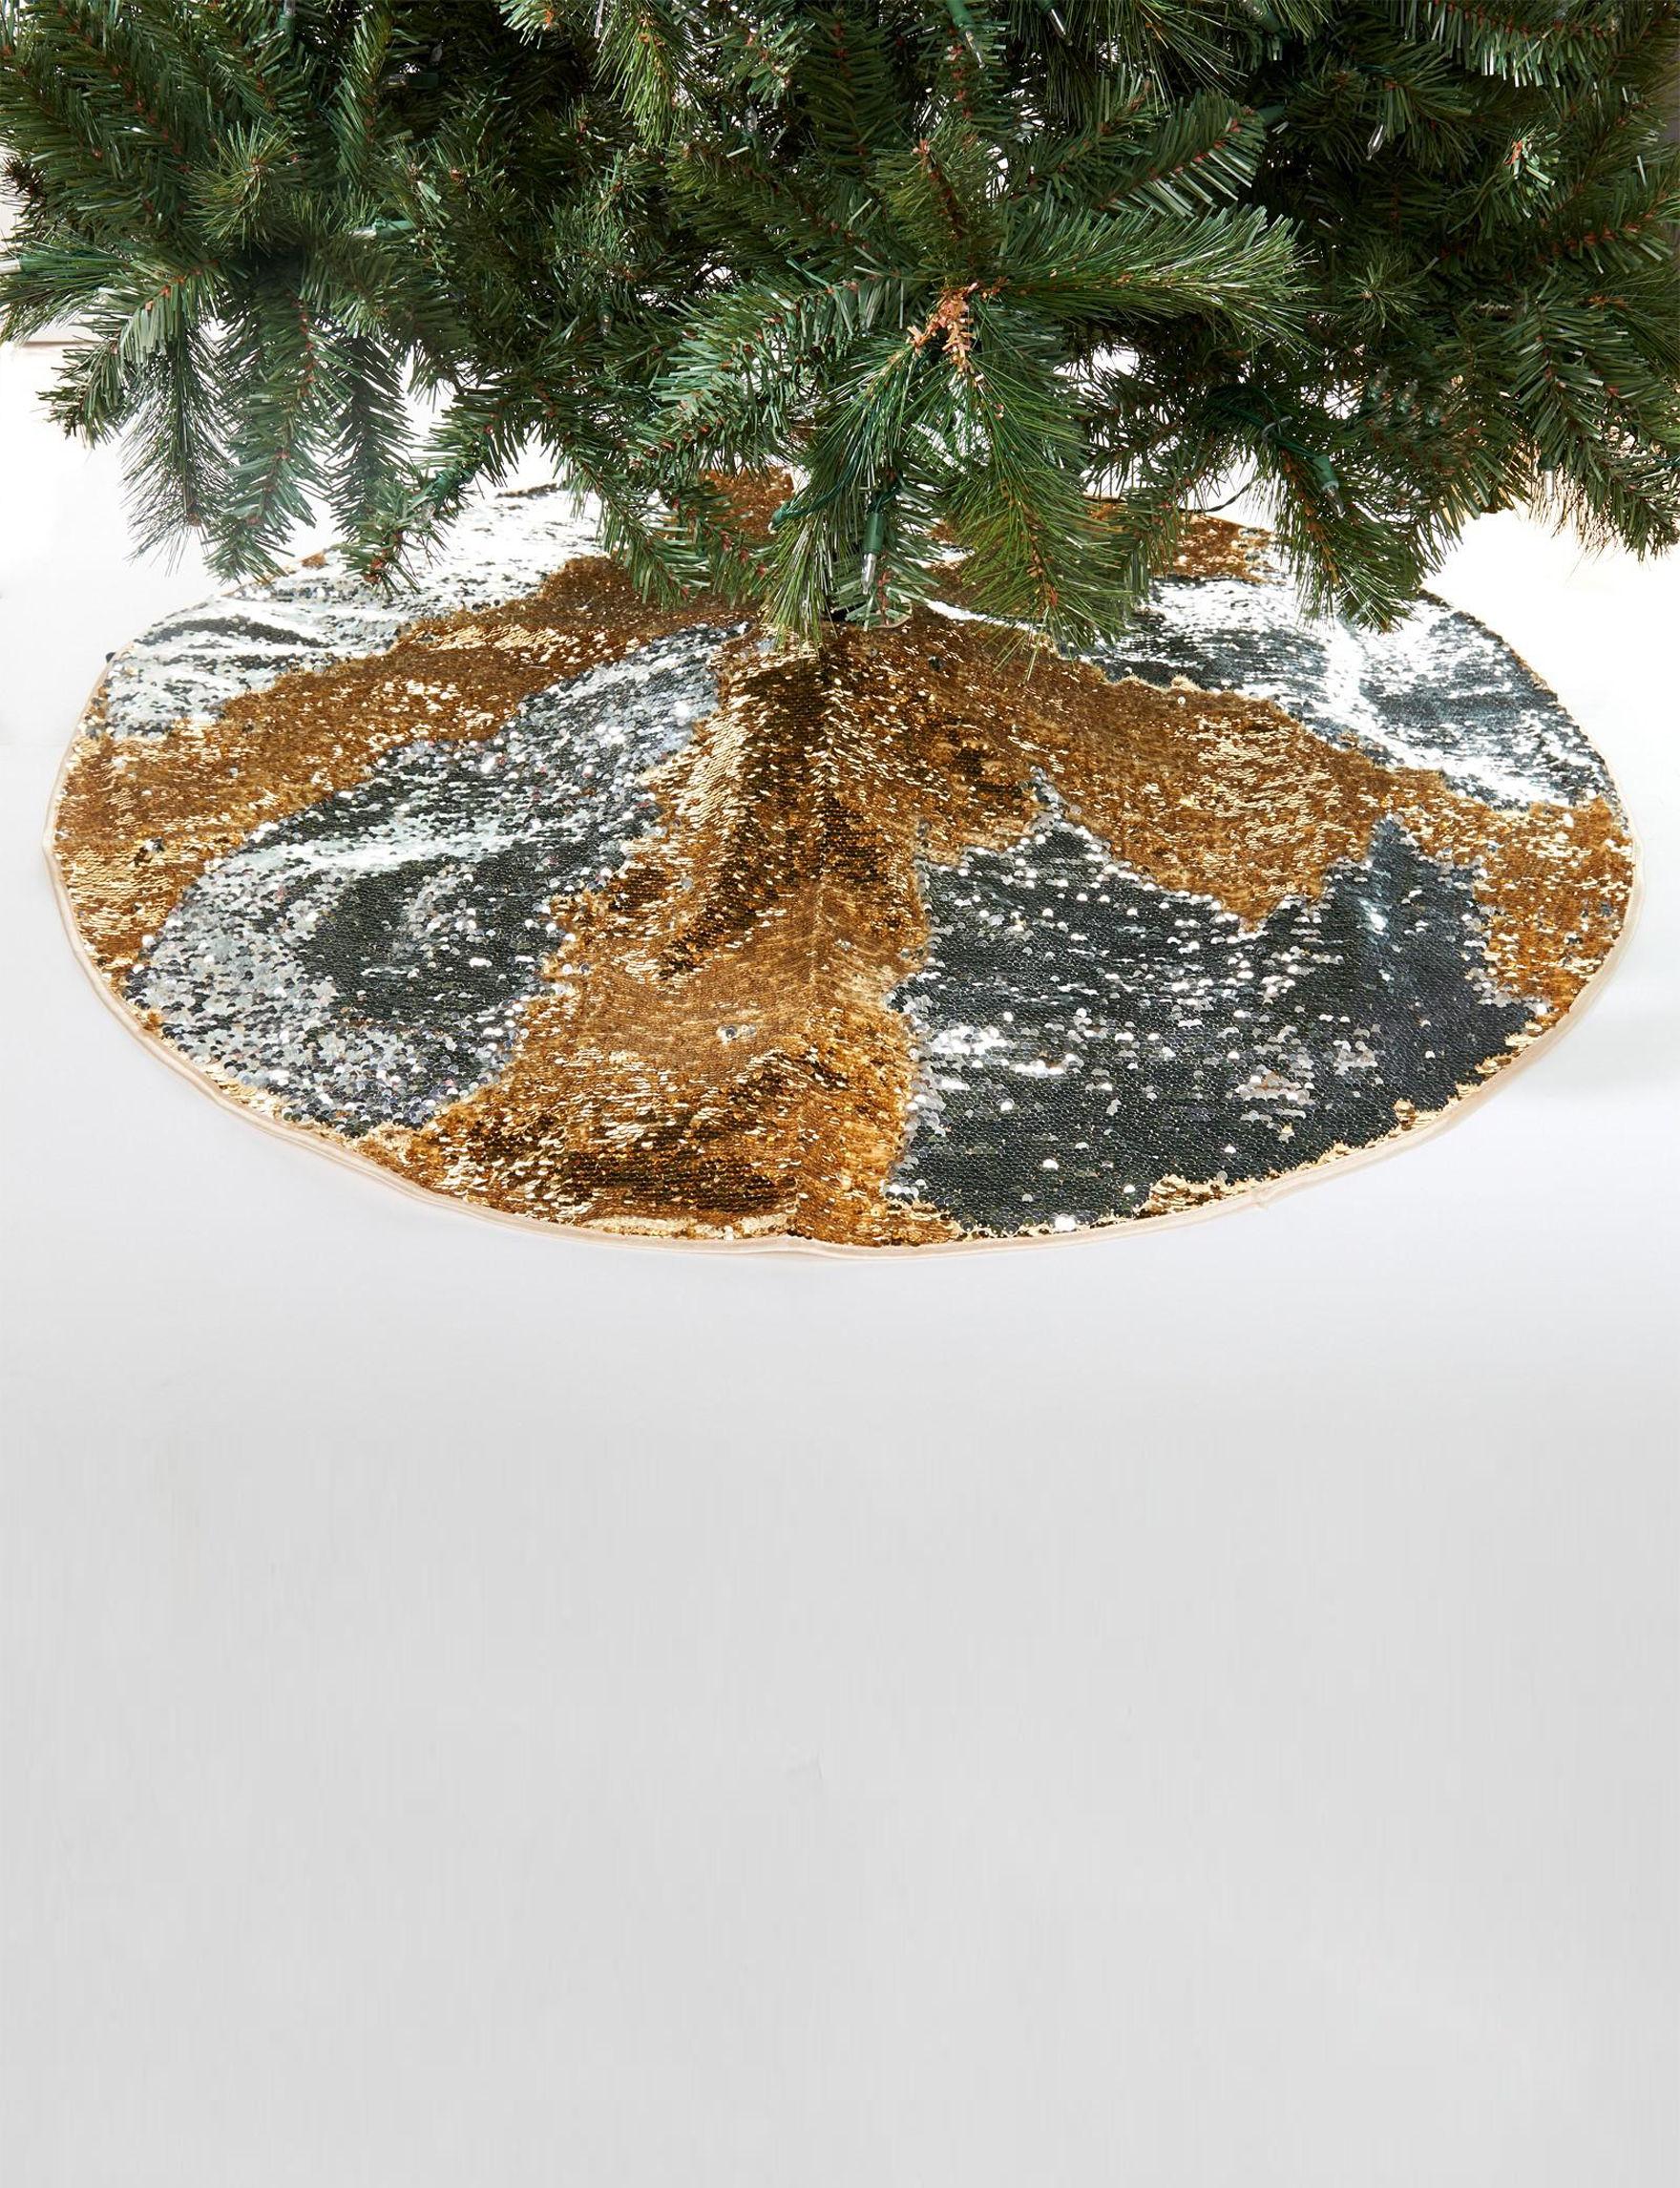 BuySeasons Silver / Gold Decorative Objects Stockings & Tree Skirts Holiday Decor